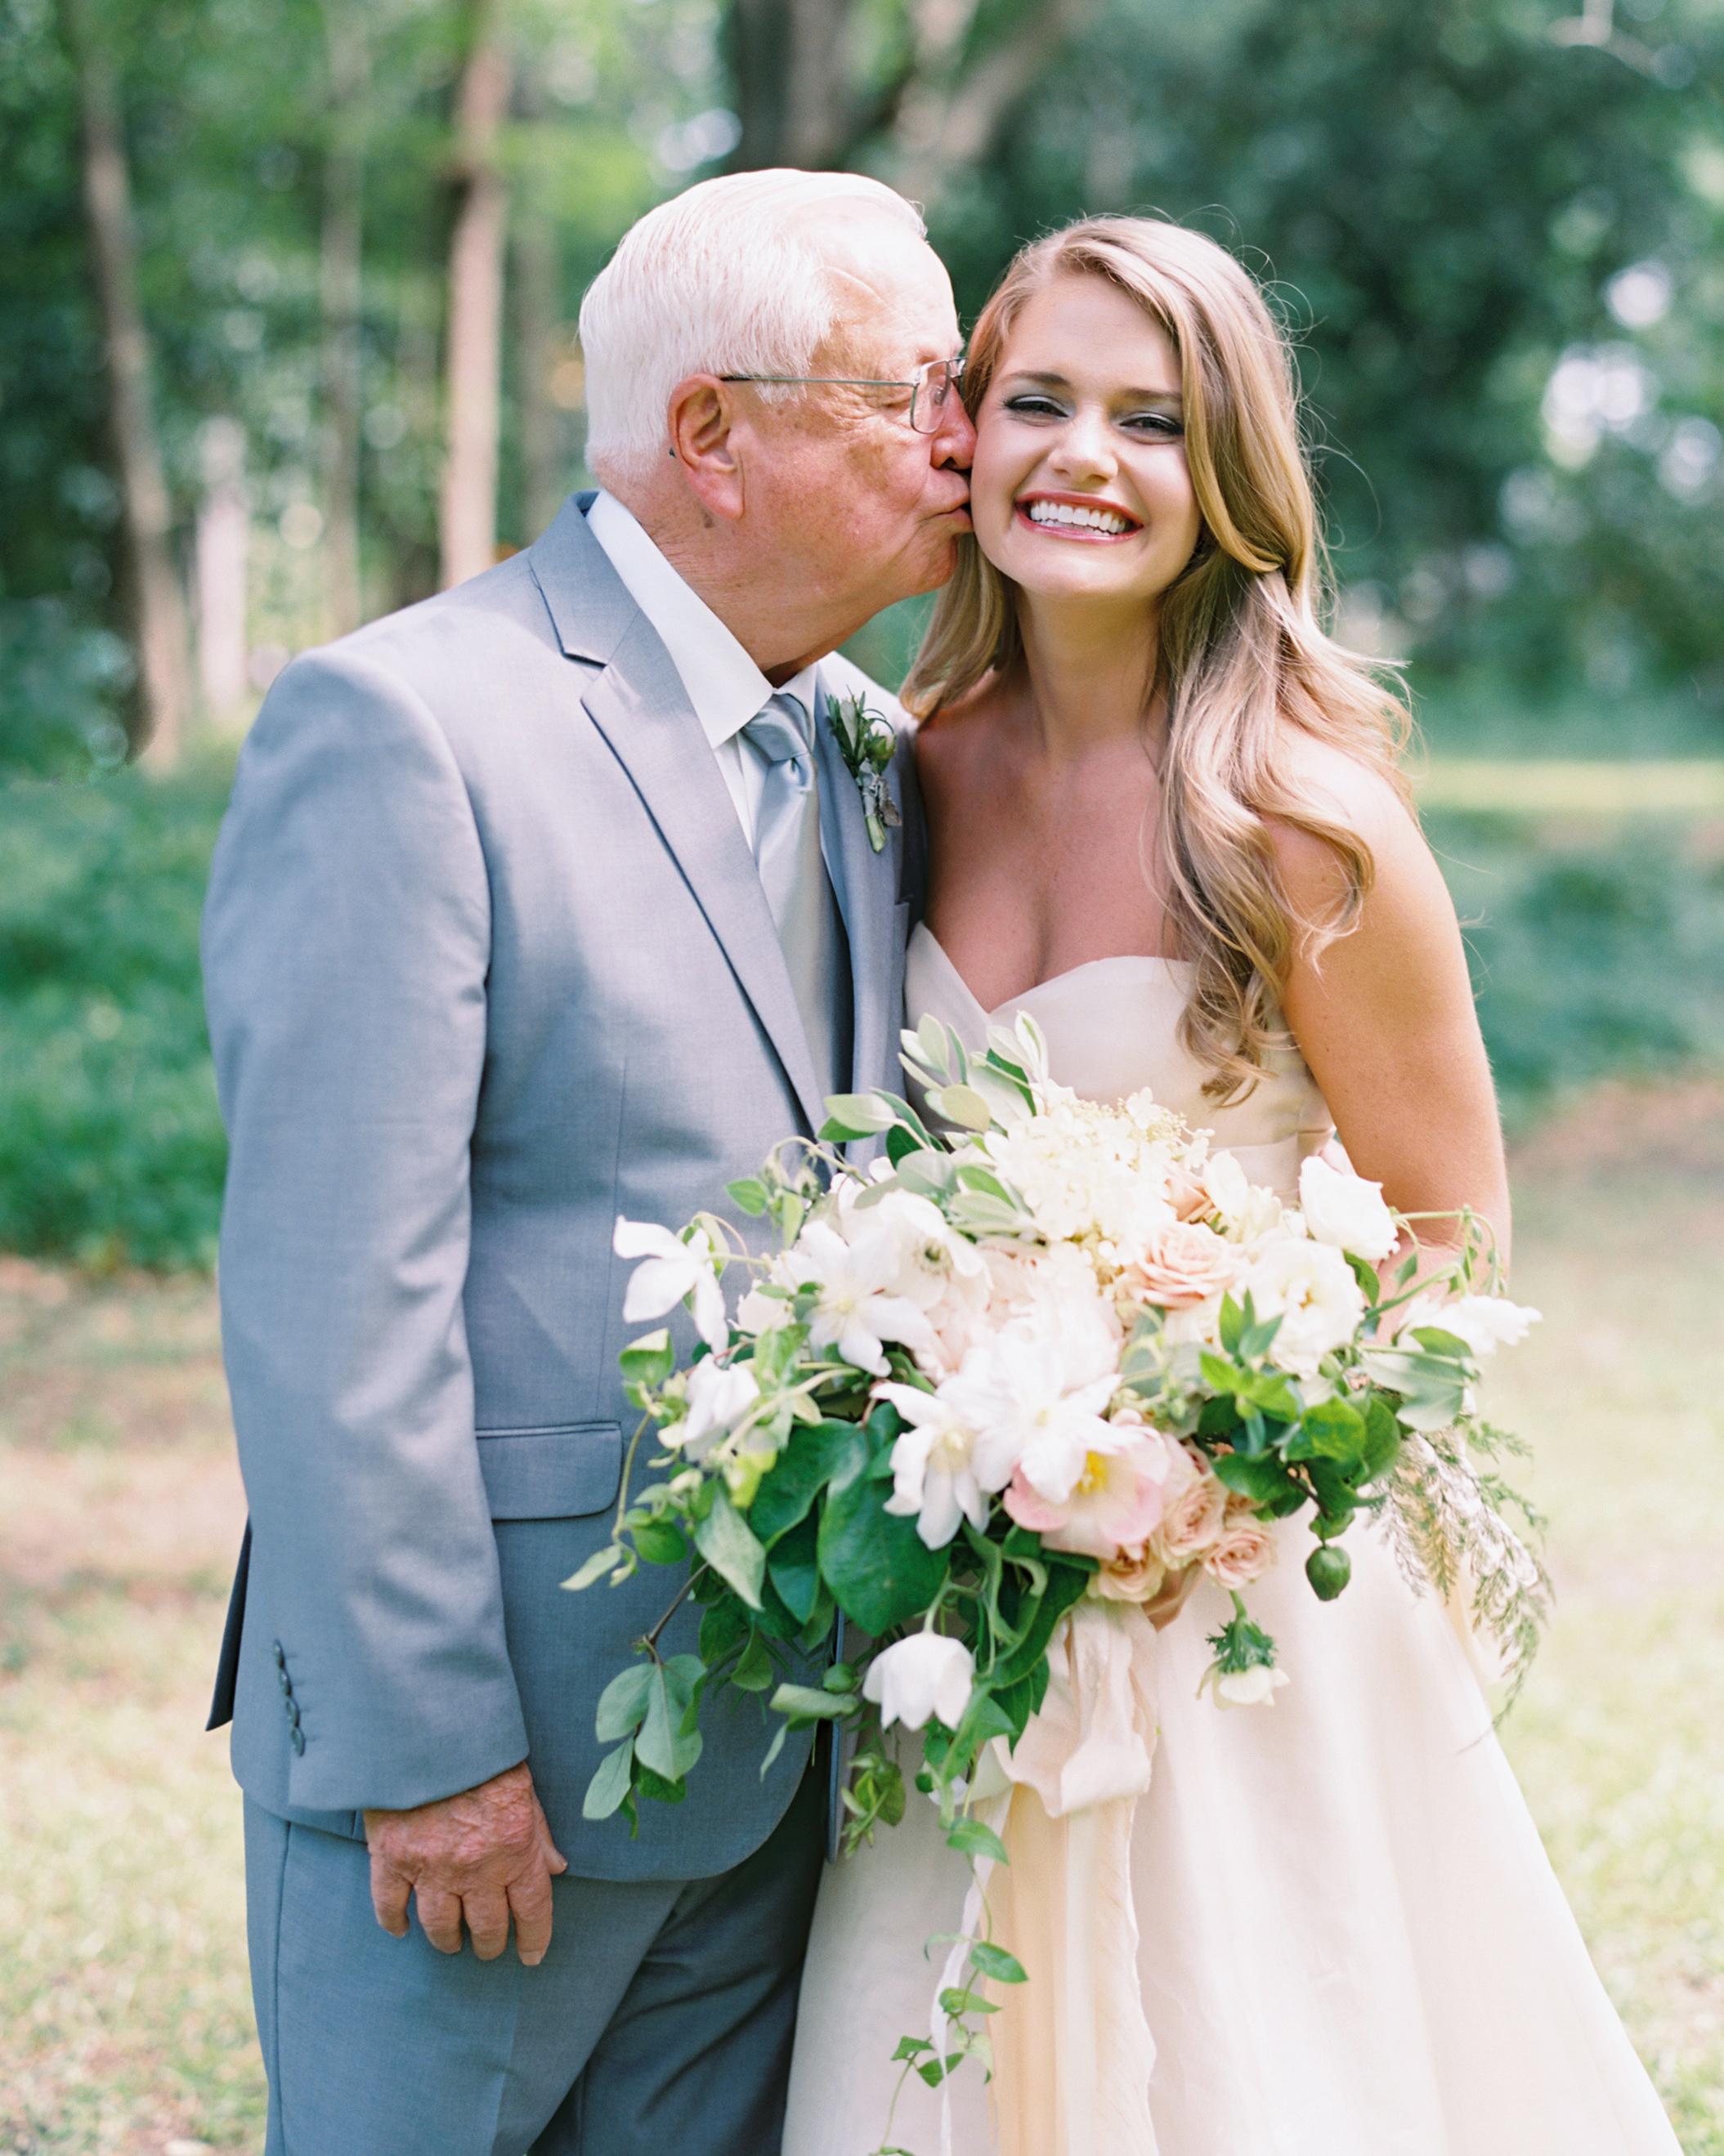 irby-adam-wedding-dad-203-s111660-1014.jpg